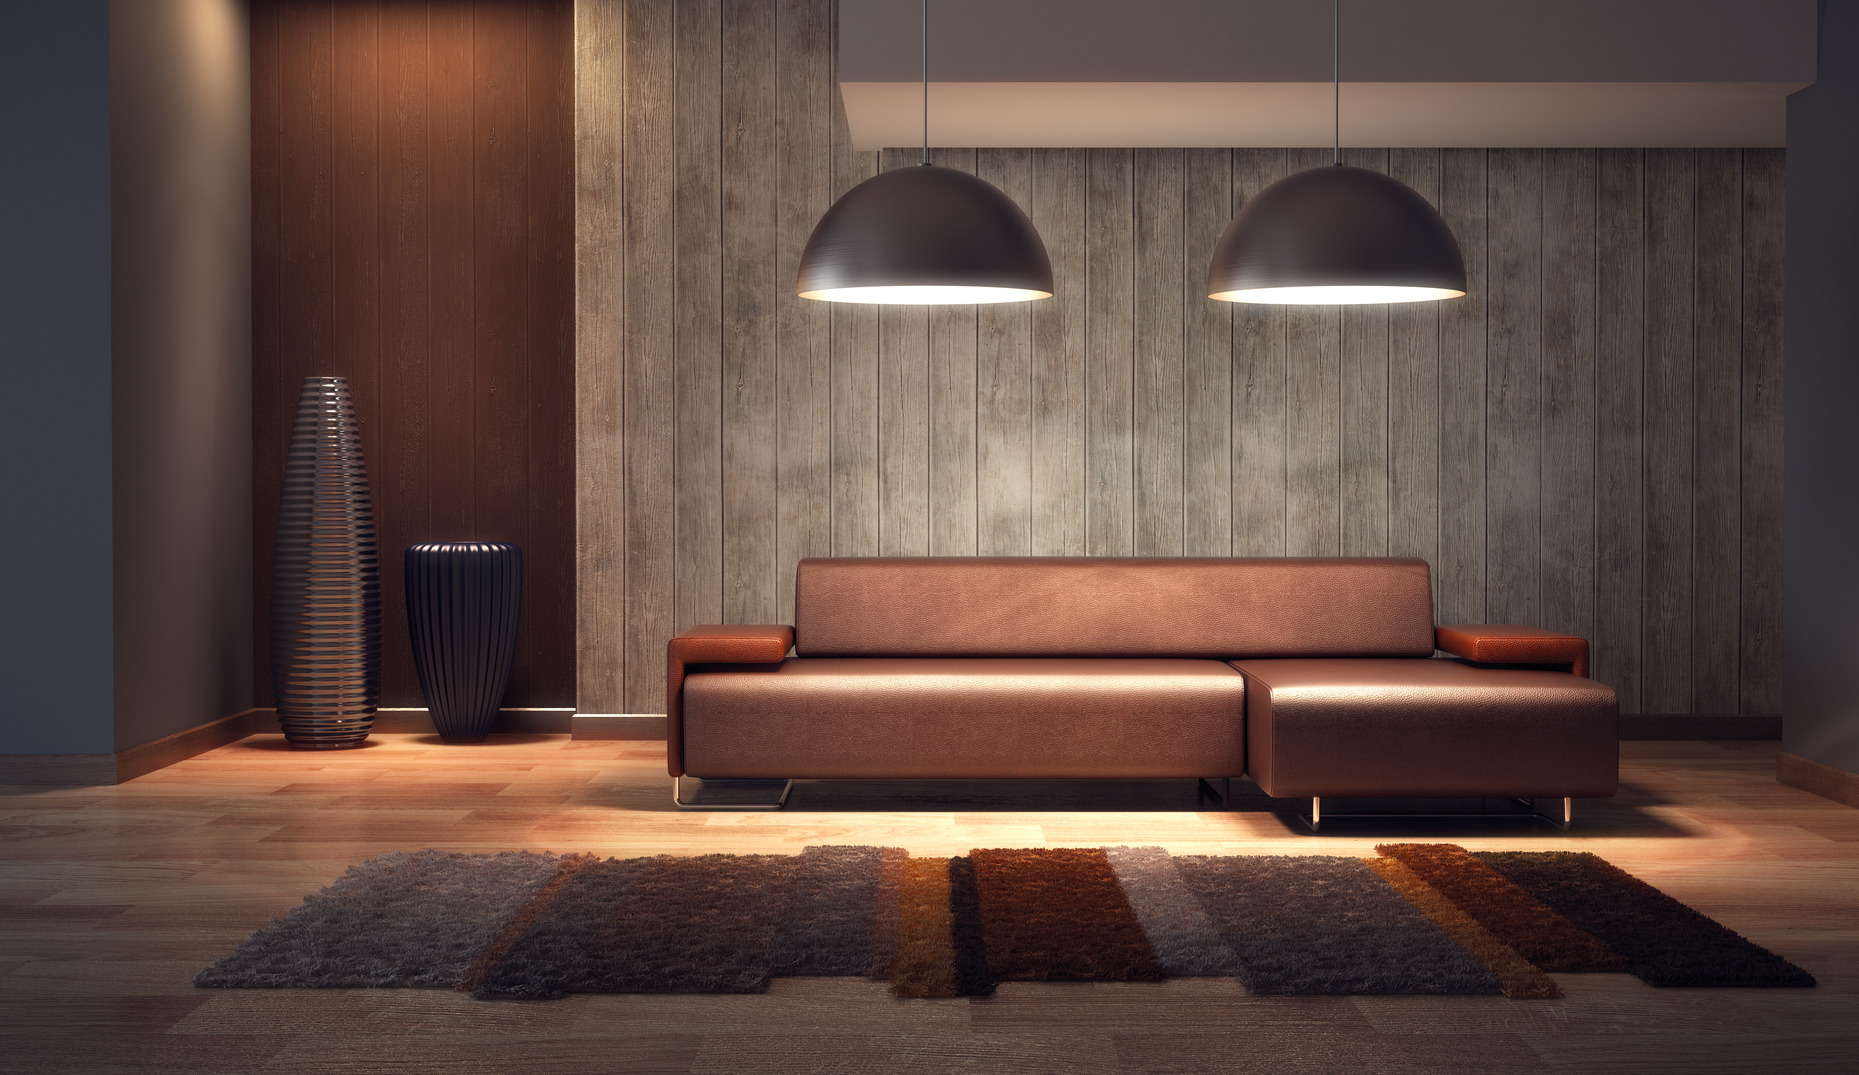 Luxury Lounge Room 3d Render Infinite Big Corp